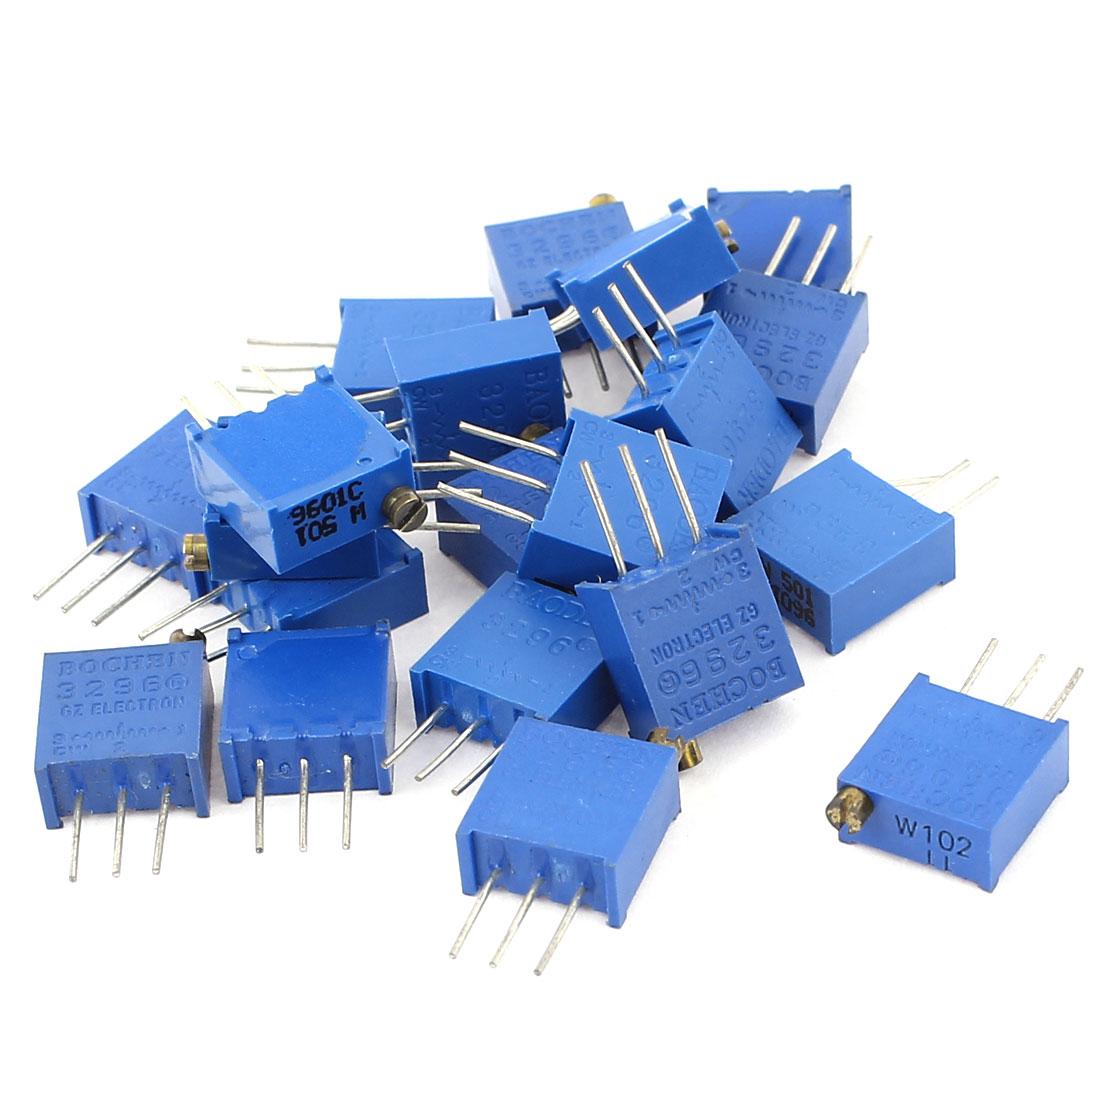 20Pcs 3296W-501 3296W-102 Resistor Trim Pot Potentiometer Trimmer